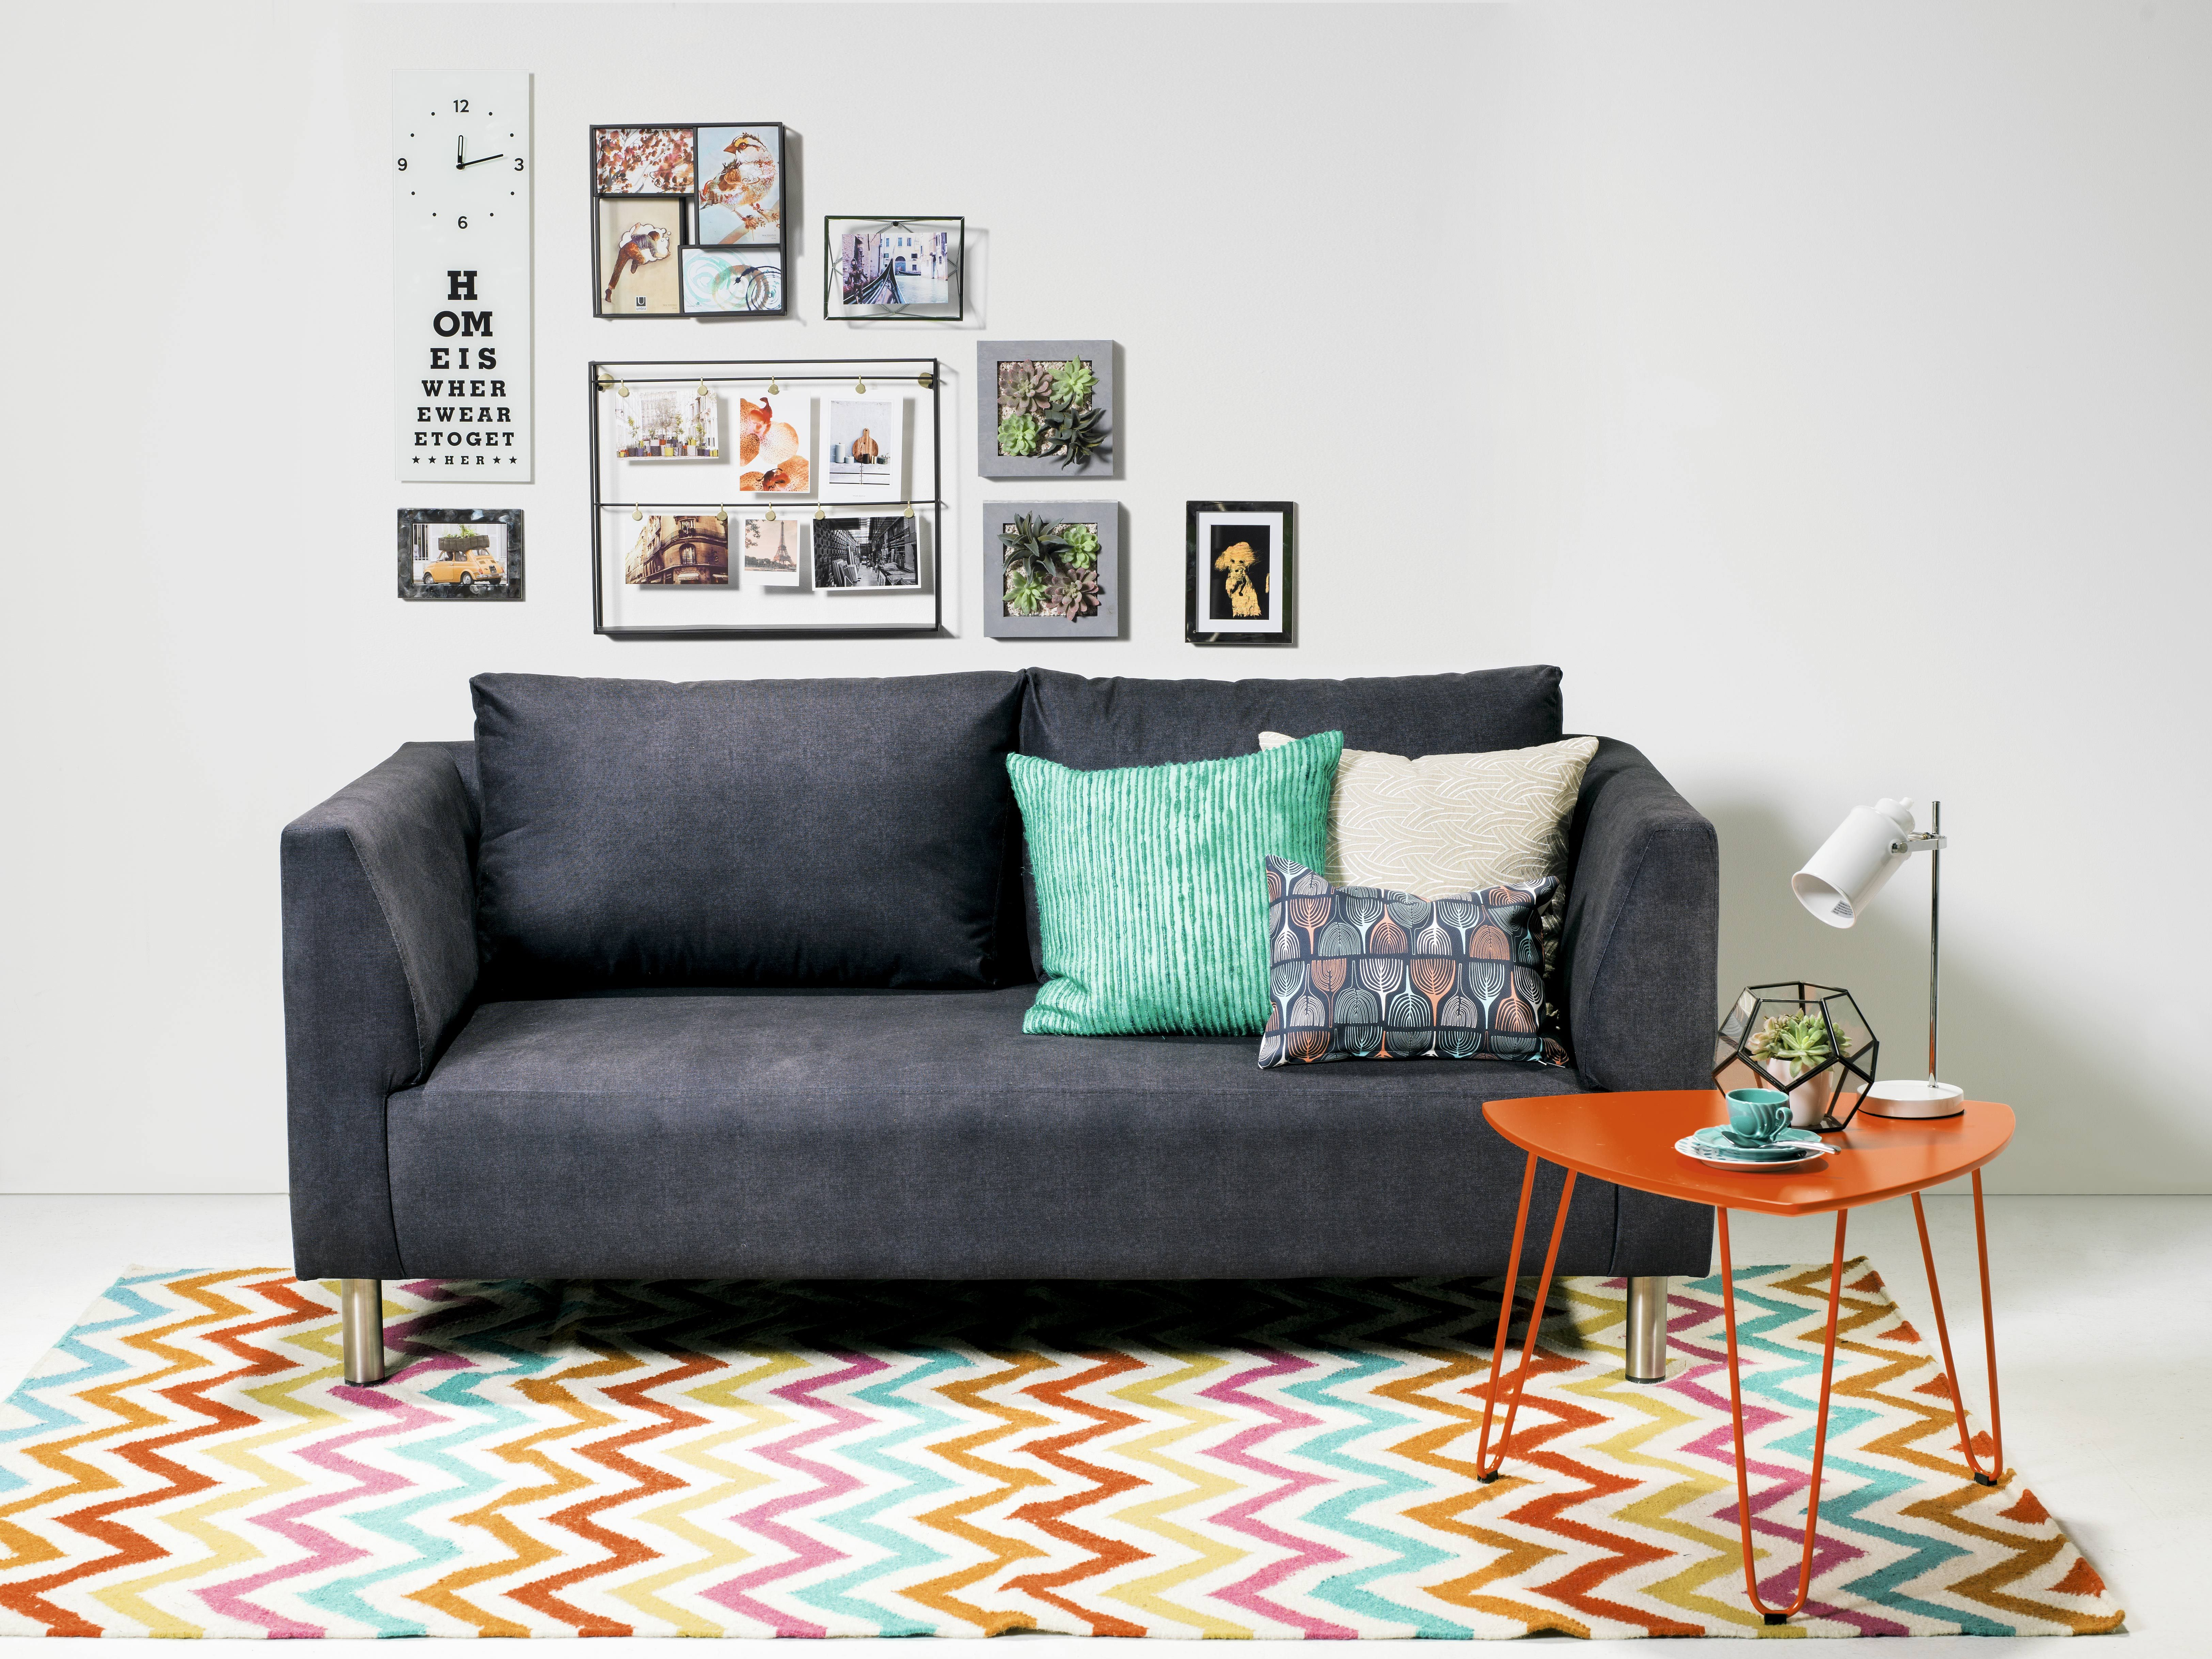 Sof lisboa de 3 puestos presentaci n en color beige for Sofas grises decoracion